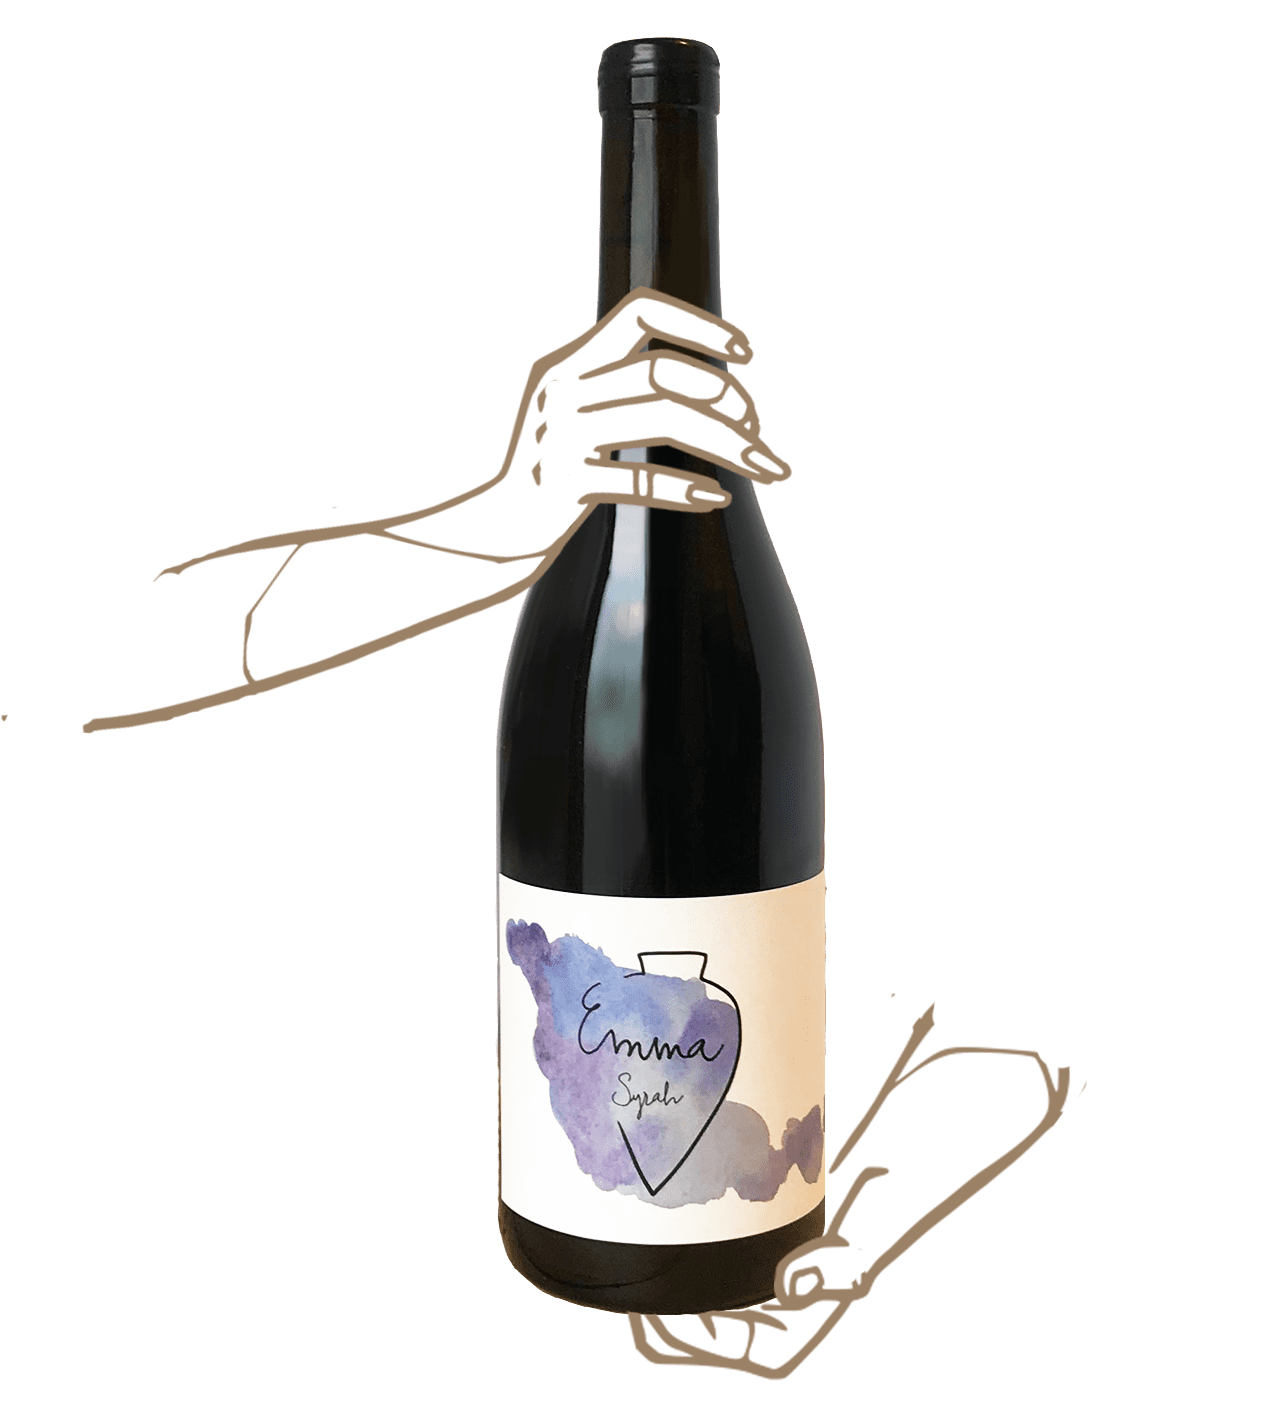 emma syrah du domaine vega aixala est un vin naturel catalan